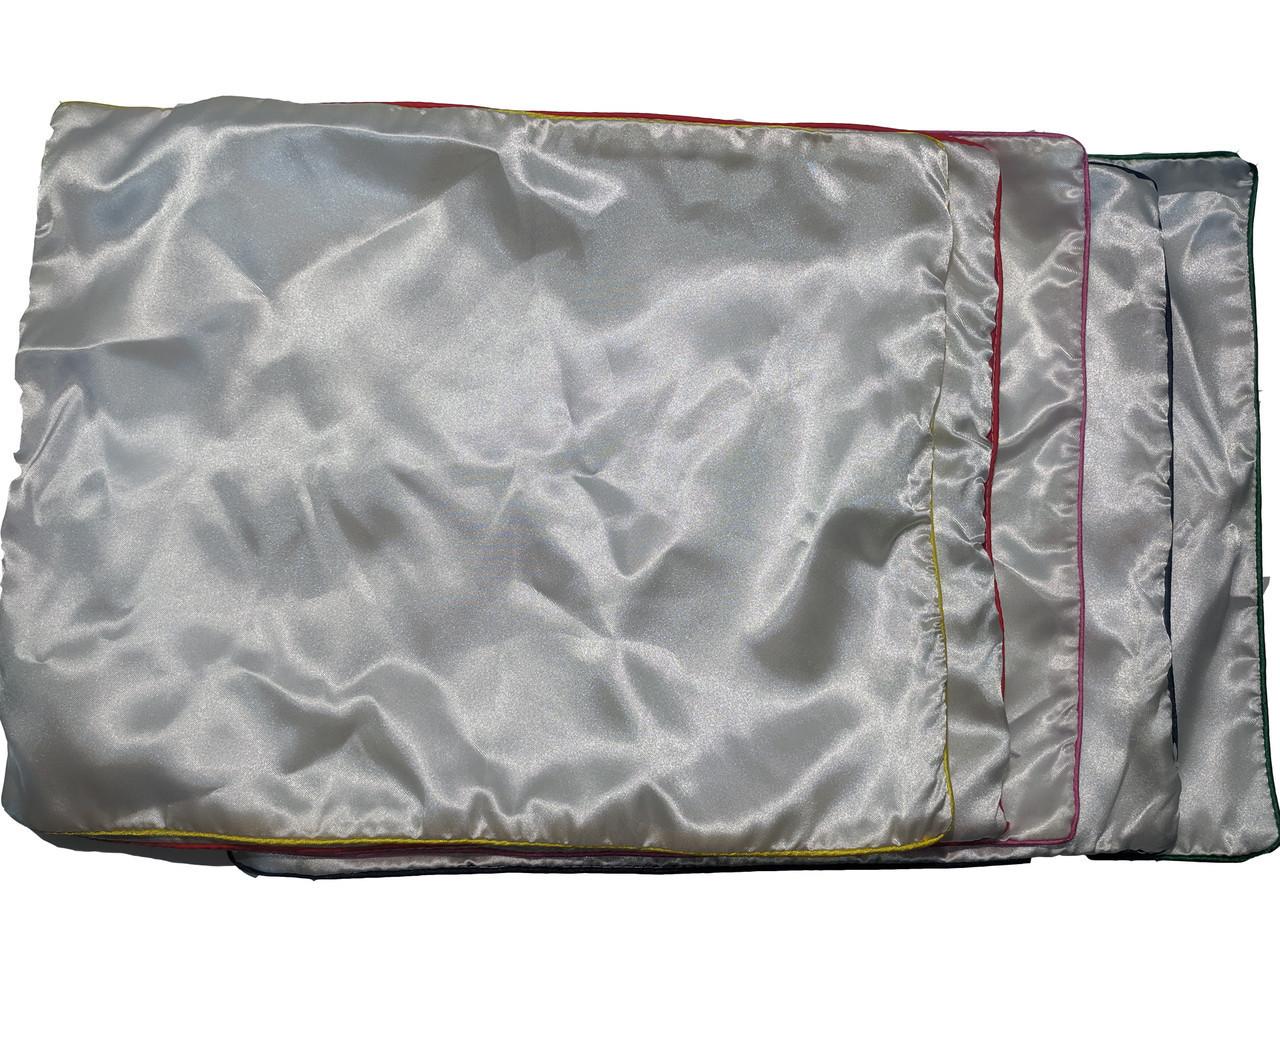 Подушка сублимационная атласная цветная с КАНТОМ 45х35 РОЗОВЫЙ